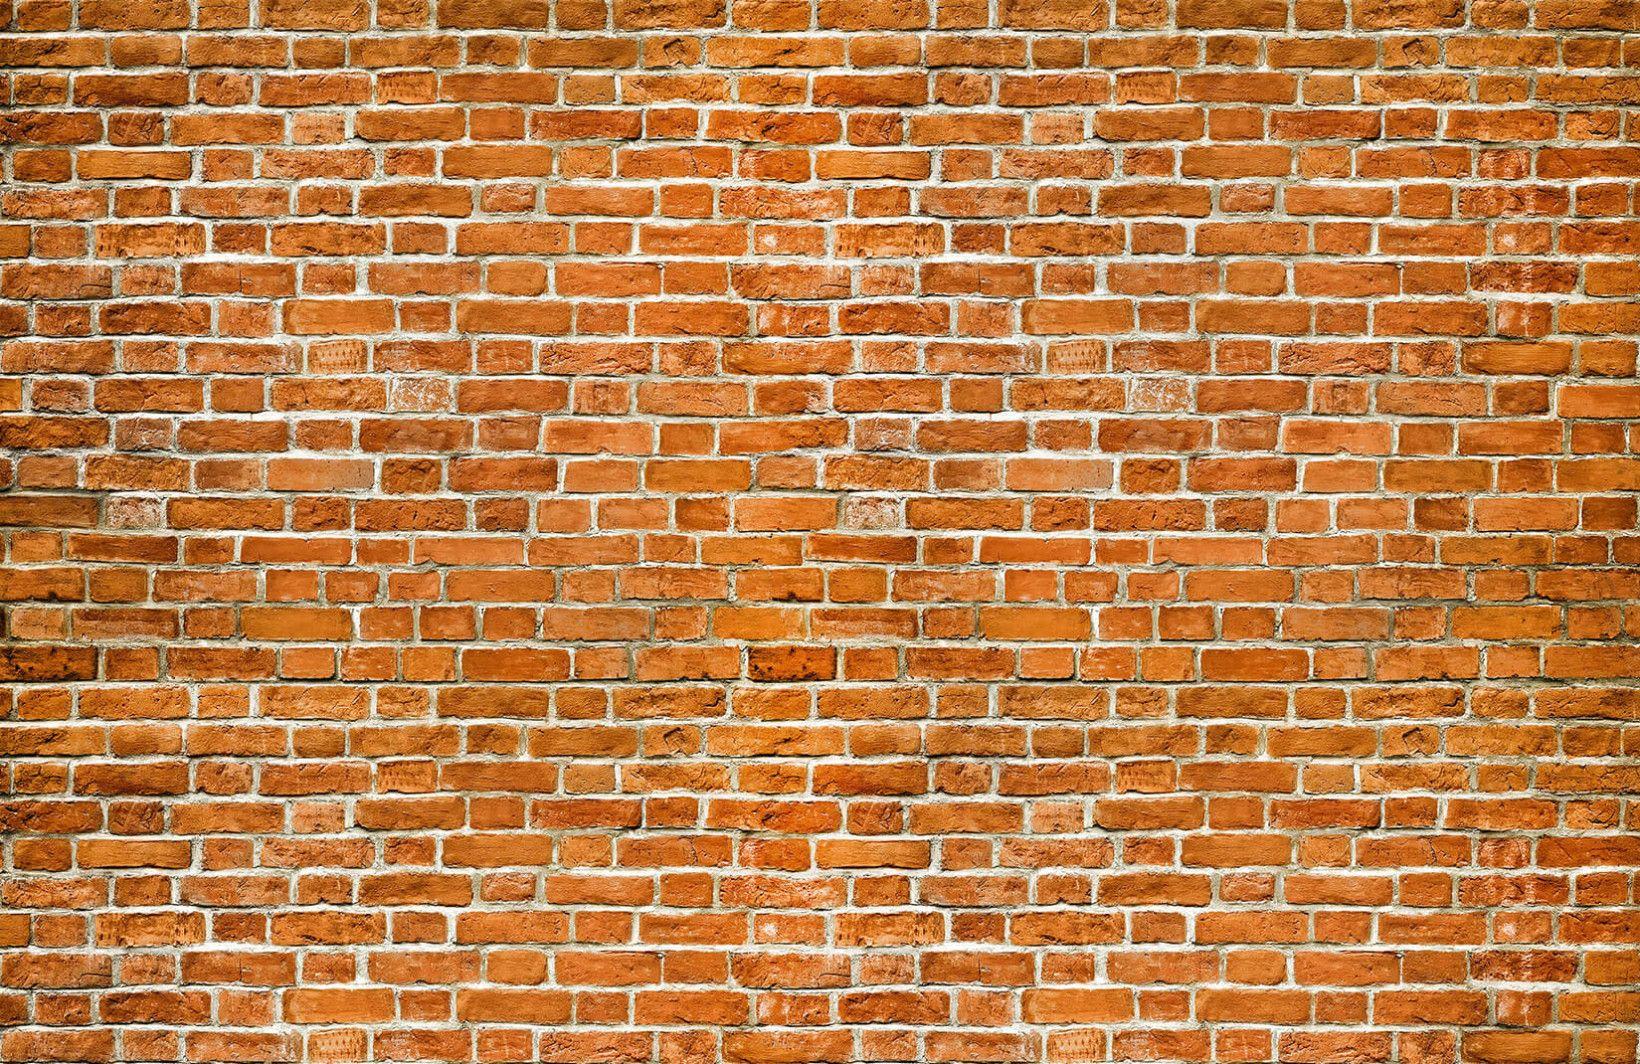 Einfaches hausdesign 2018 orange brick wallpaper wall mural  muralswallpaper